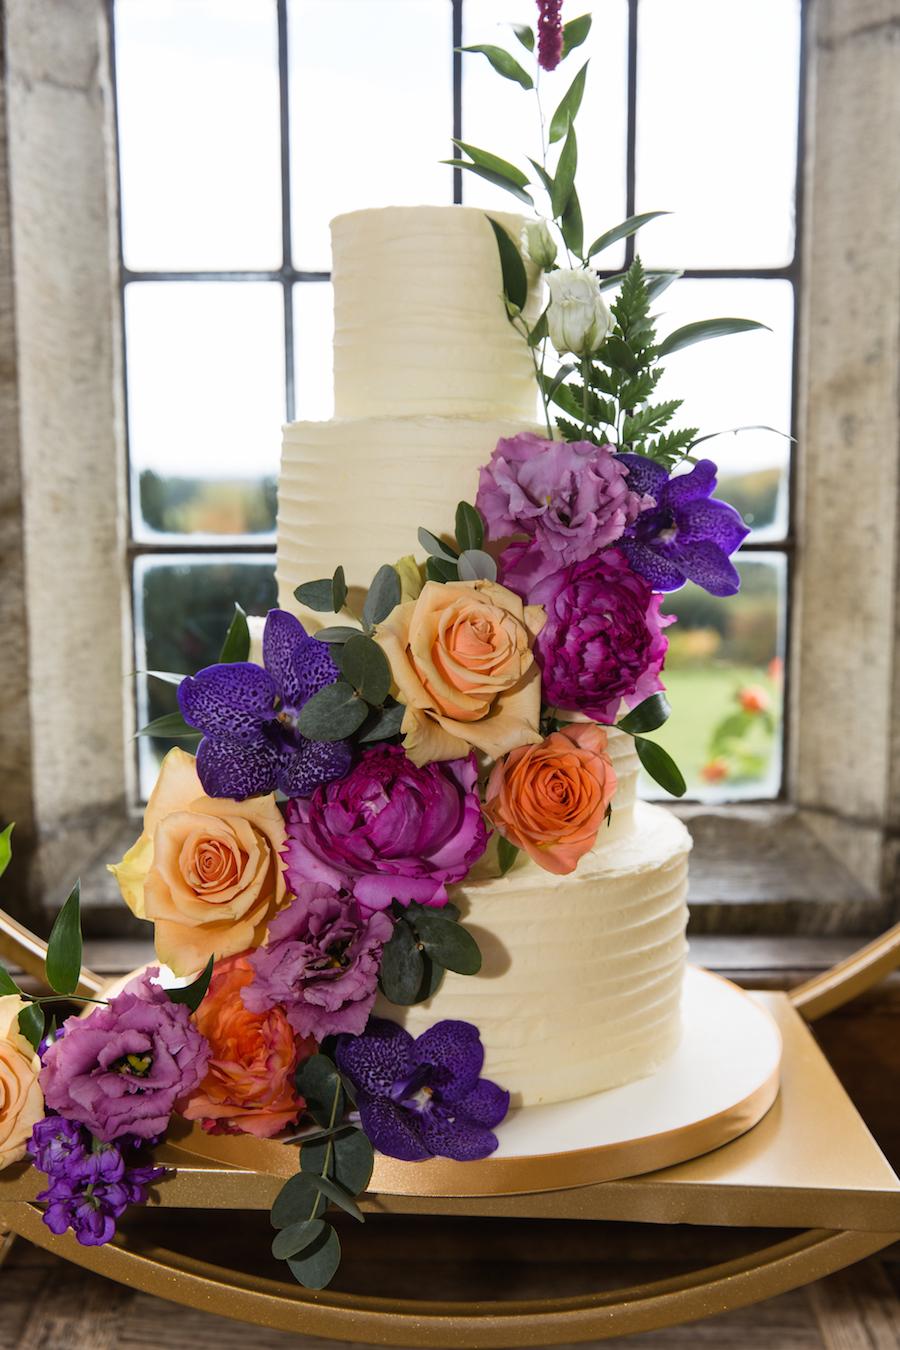 Jewel toned autumn wedding vibes from Layer Marney, image credit Ayshea Goldberg Photography (16)